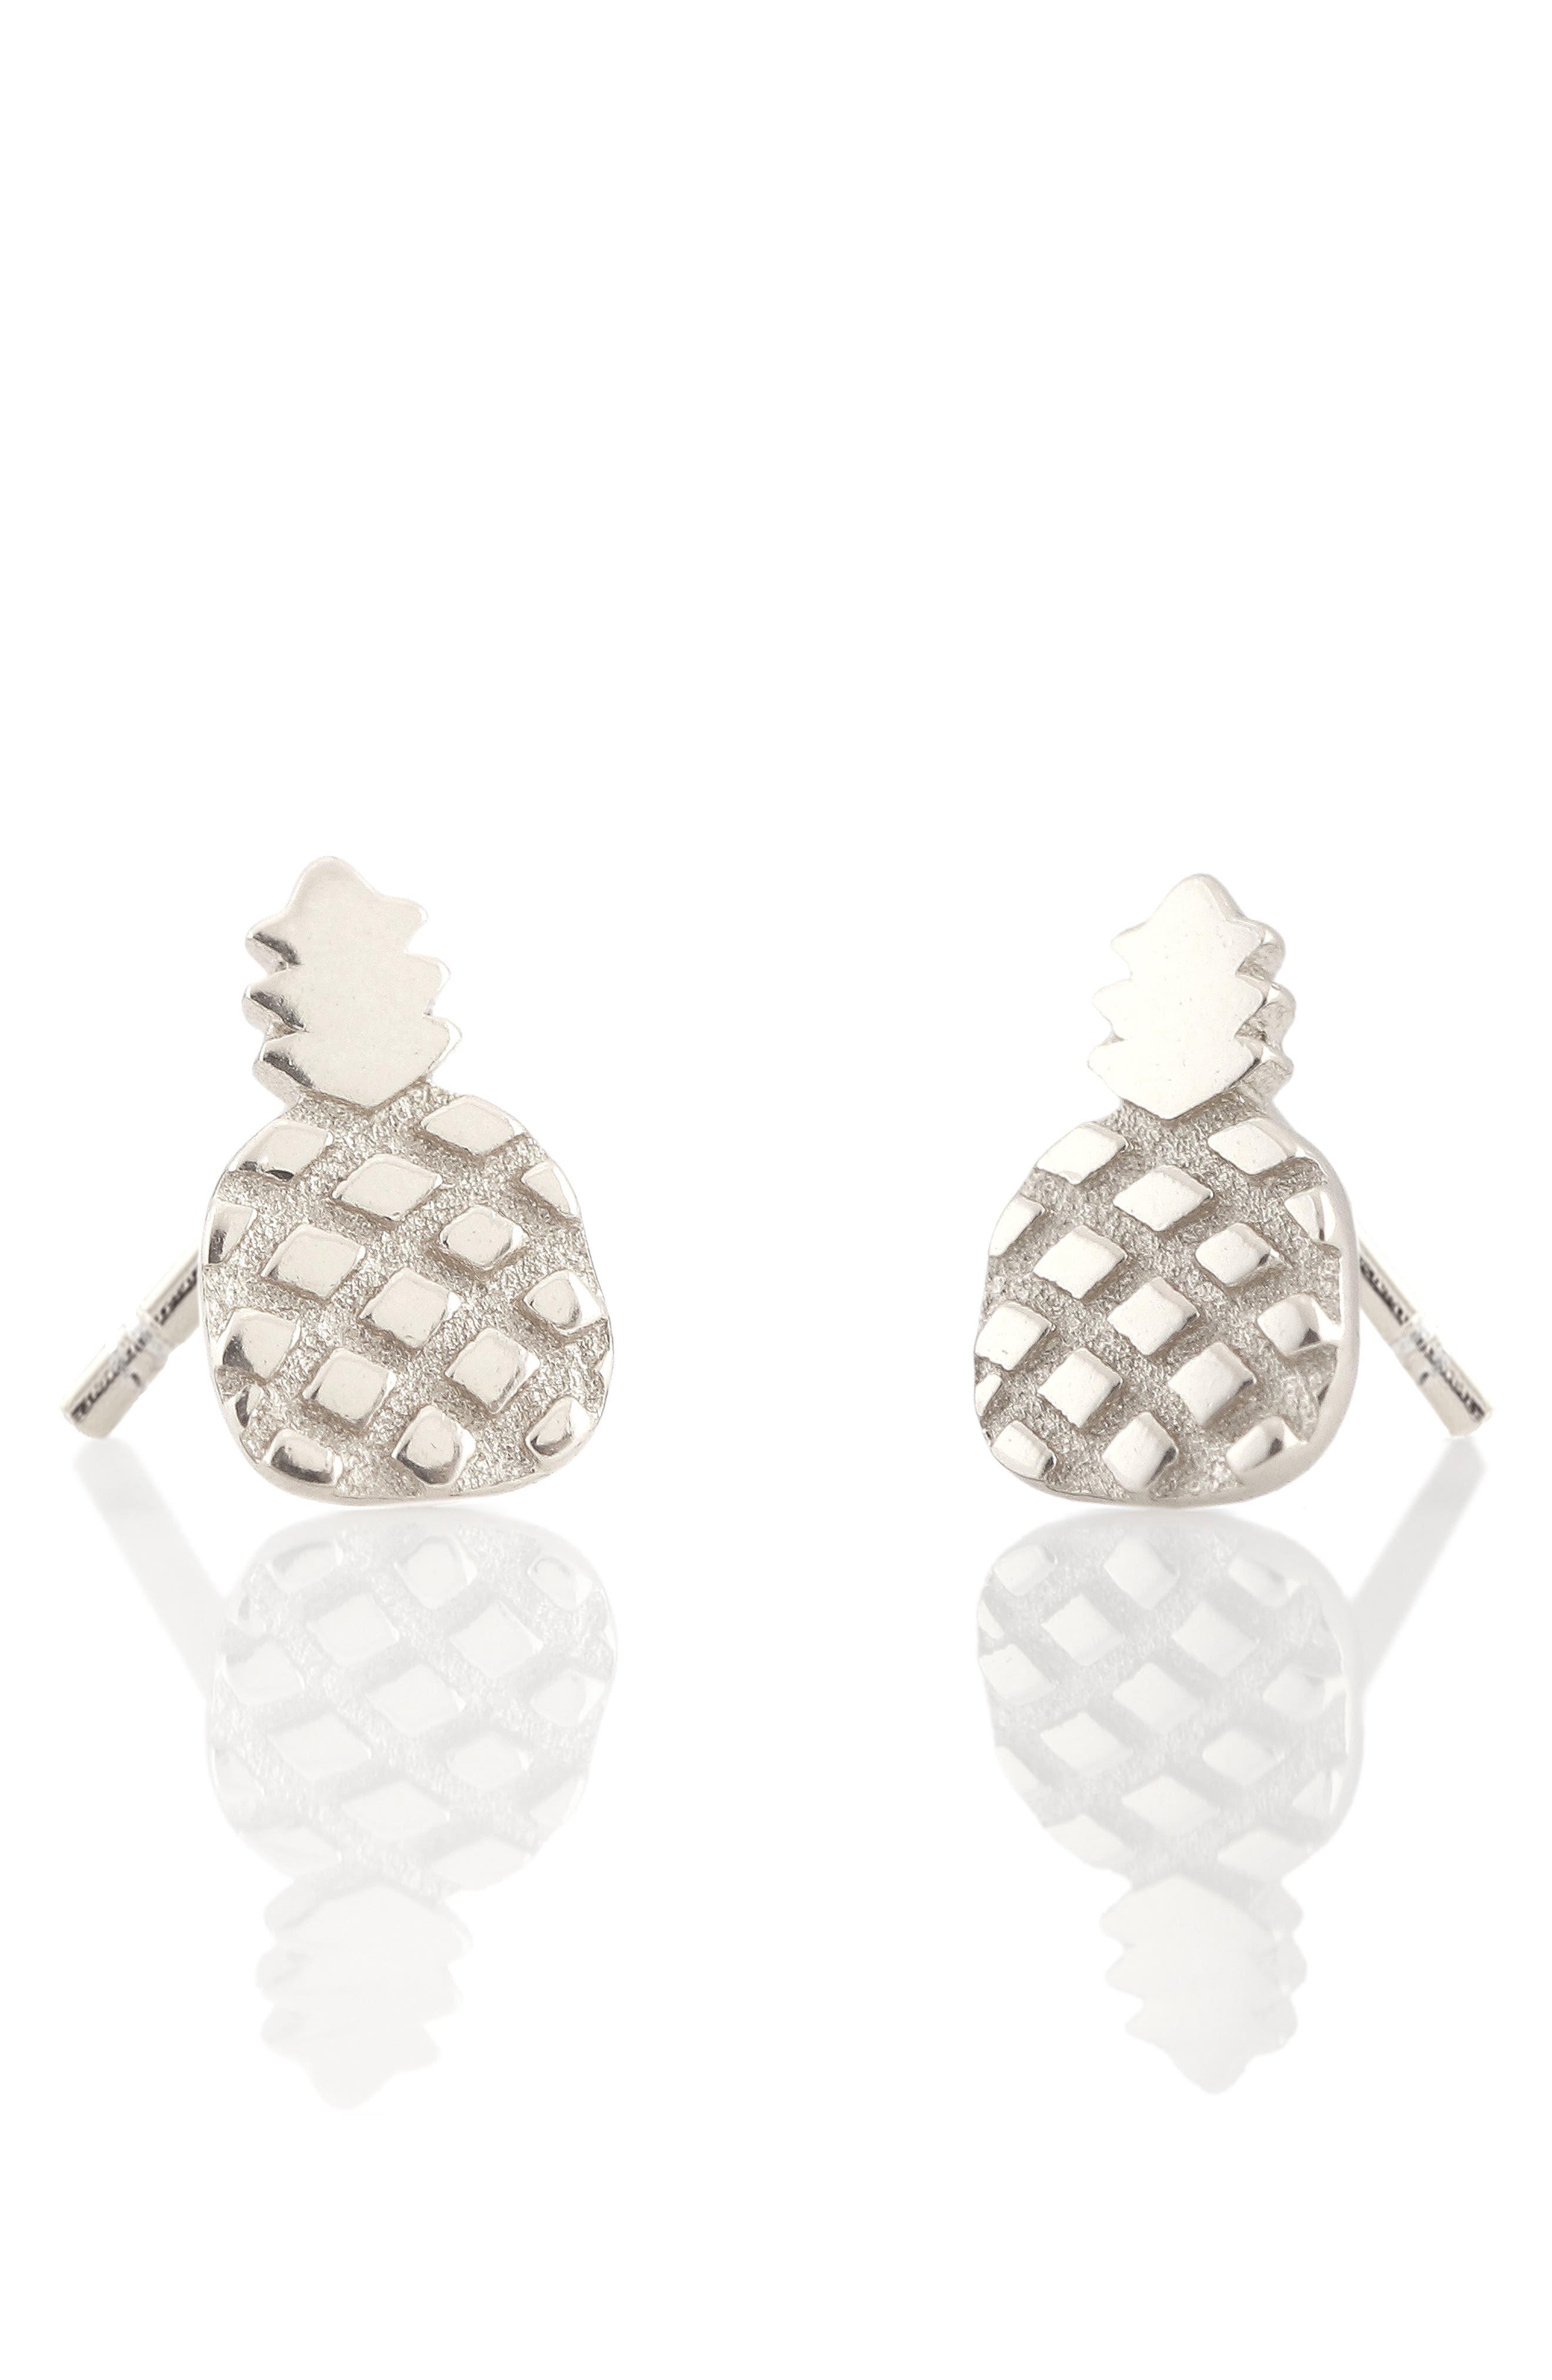 Pineapple Stud Earrings,                             Main thumbnail 1, color,                             SILVER